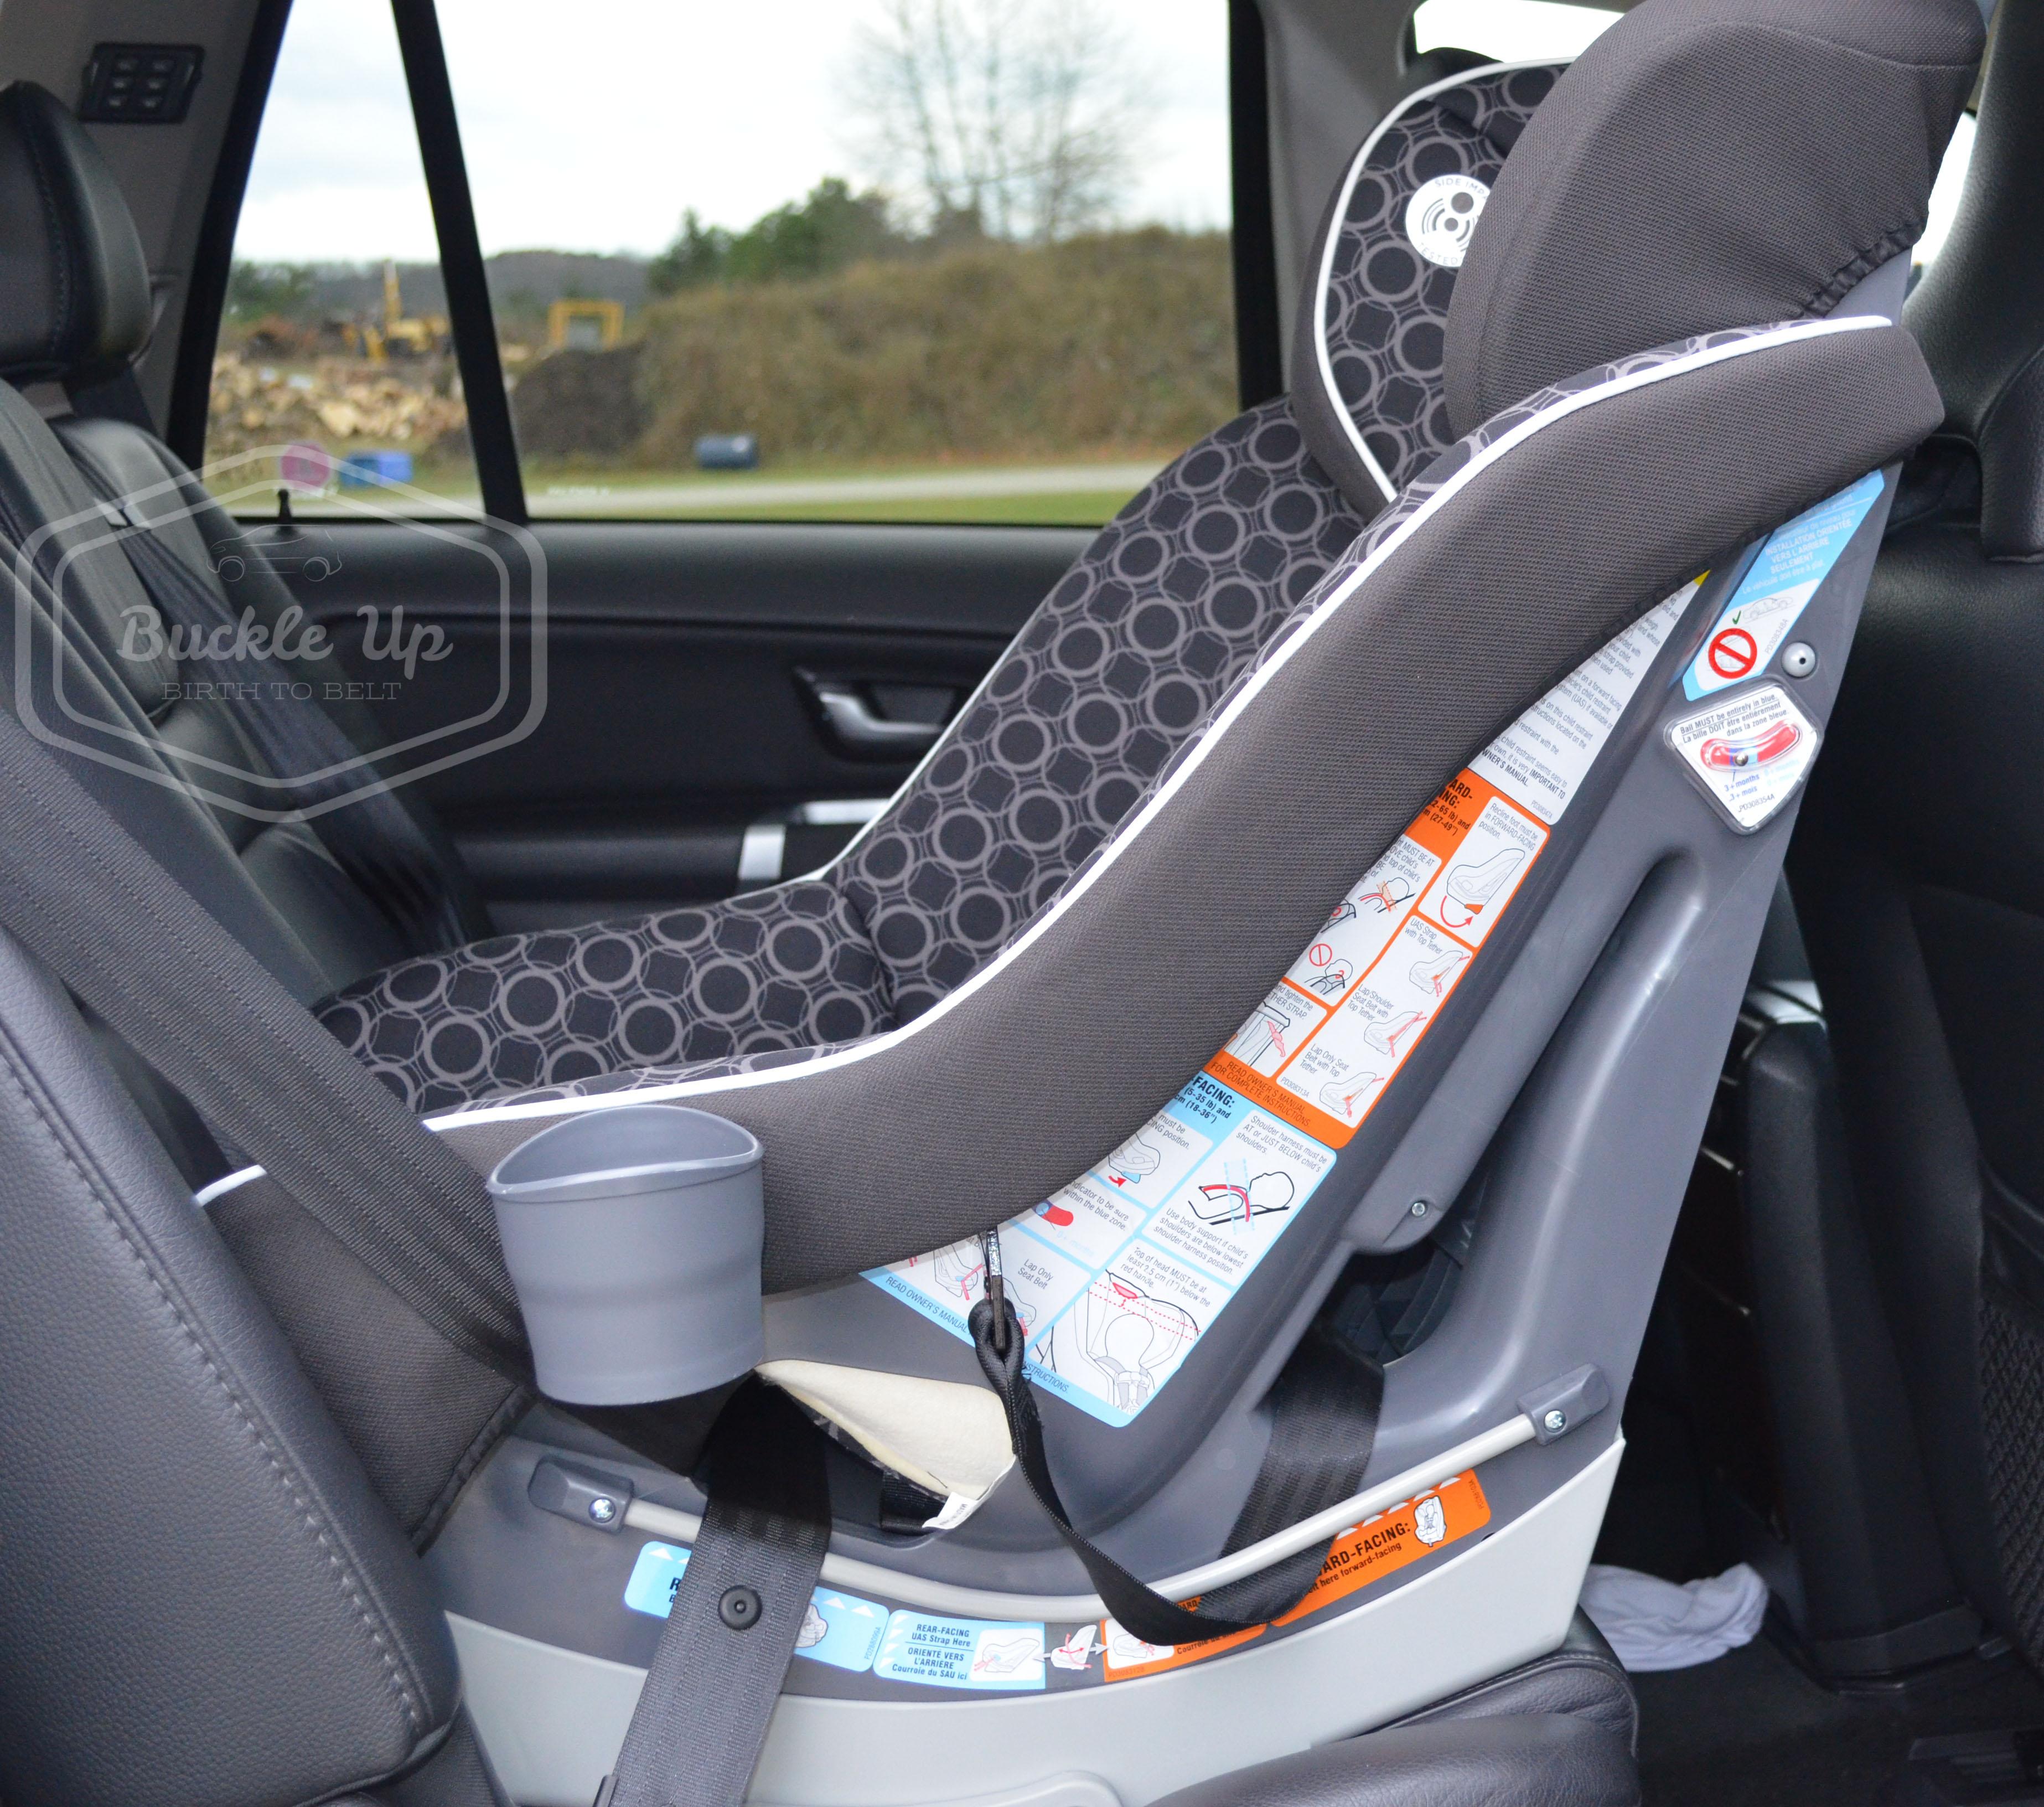 forward facing reclining car seat pria 85 ff upright v recline. Black Bedroom Furniture Sets. Home Design Ideas